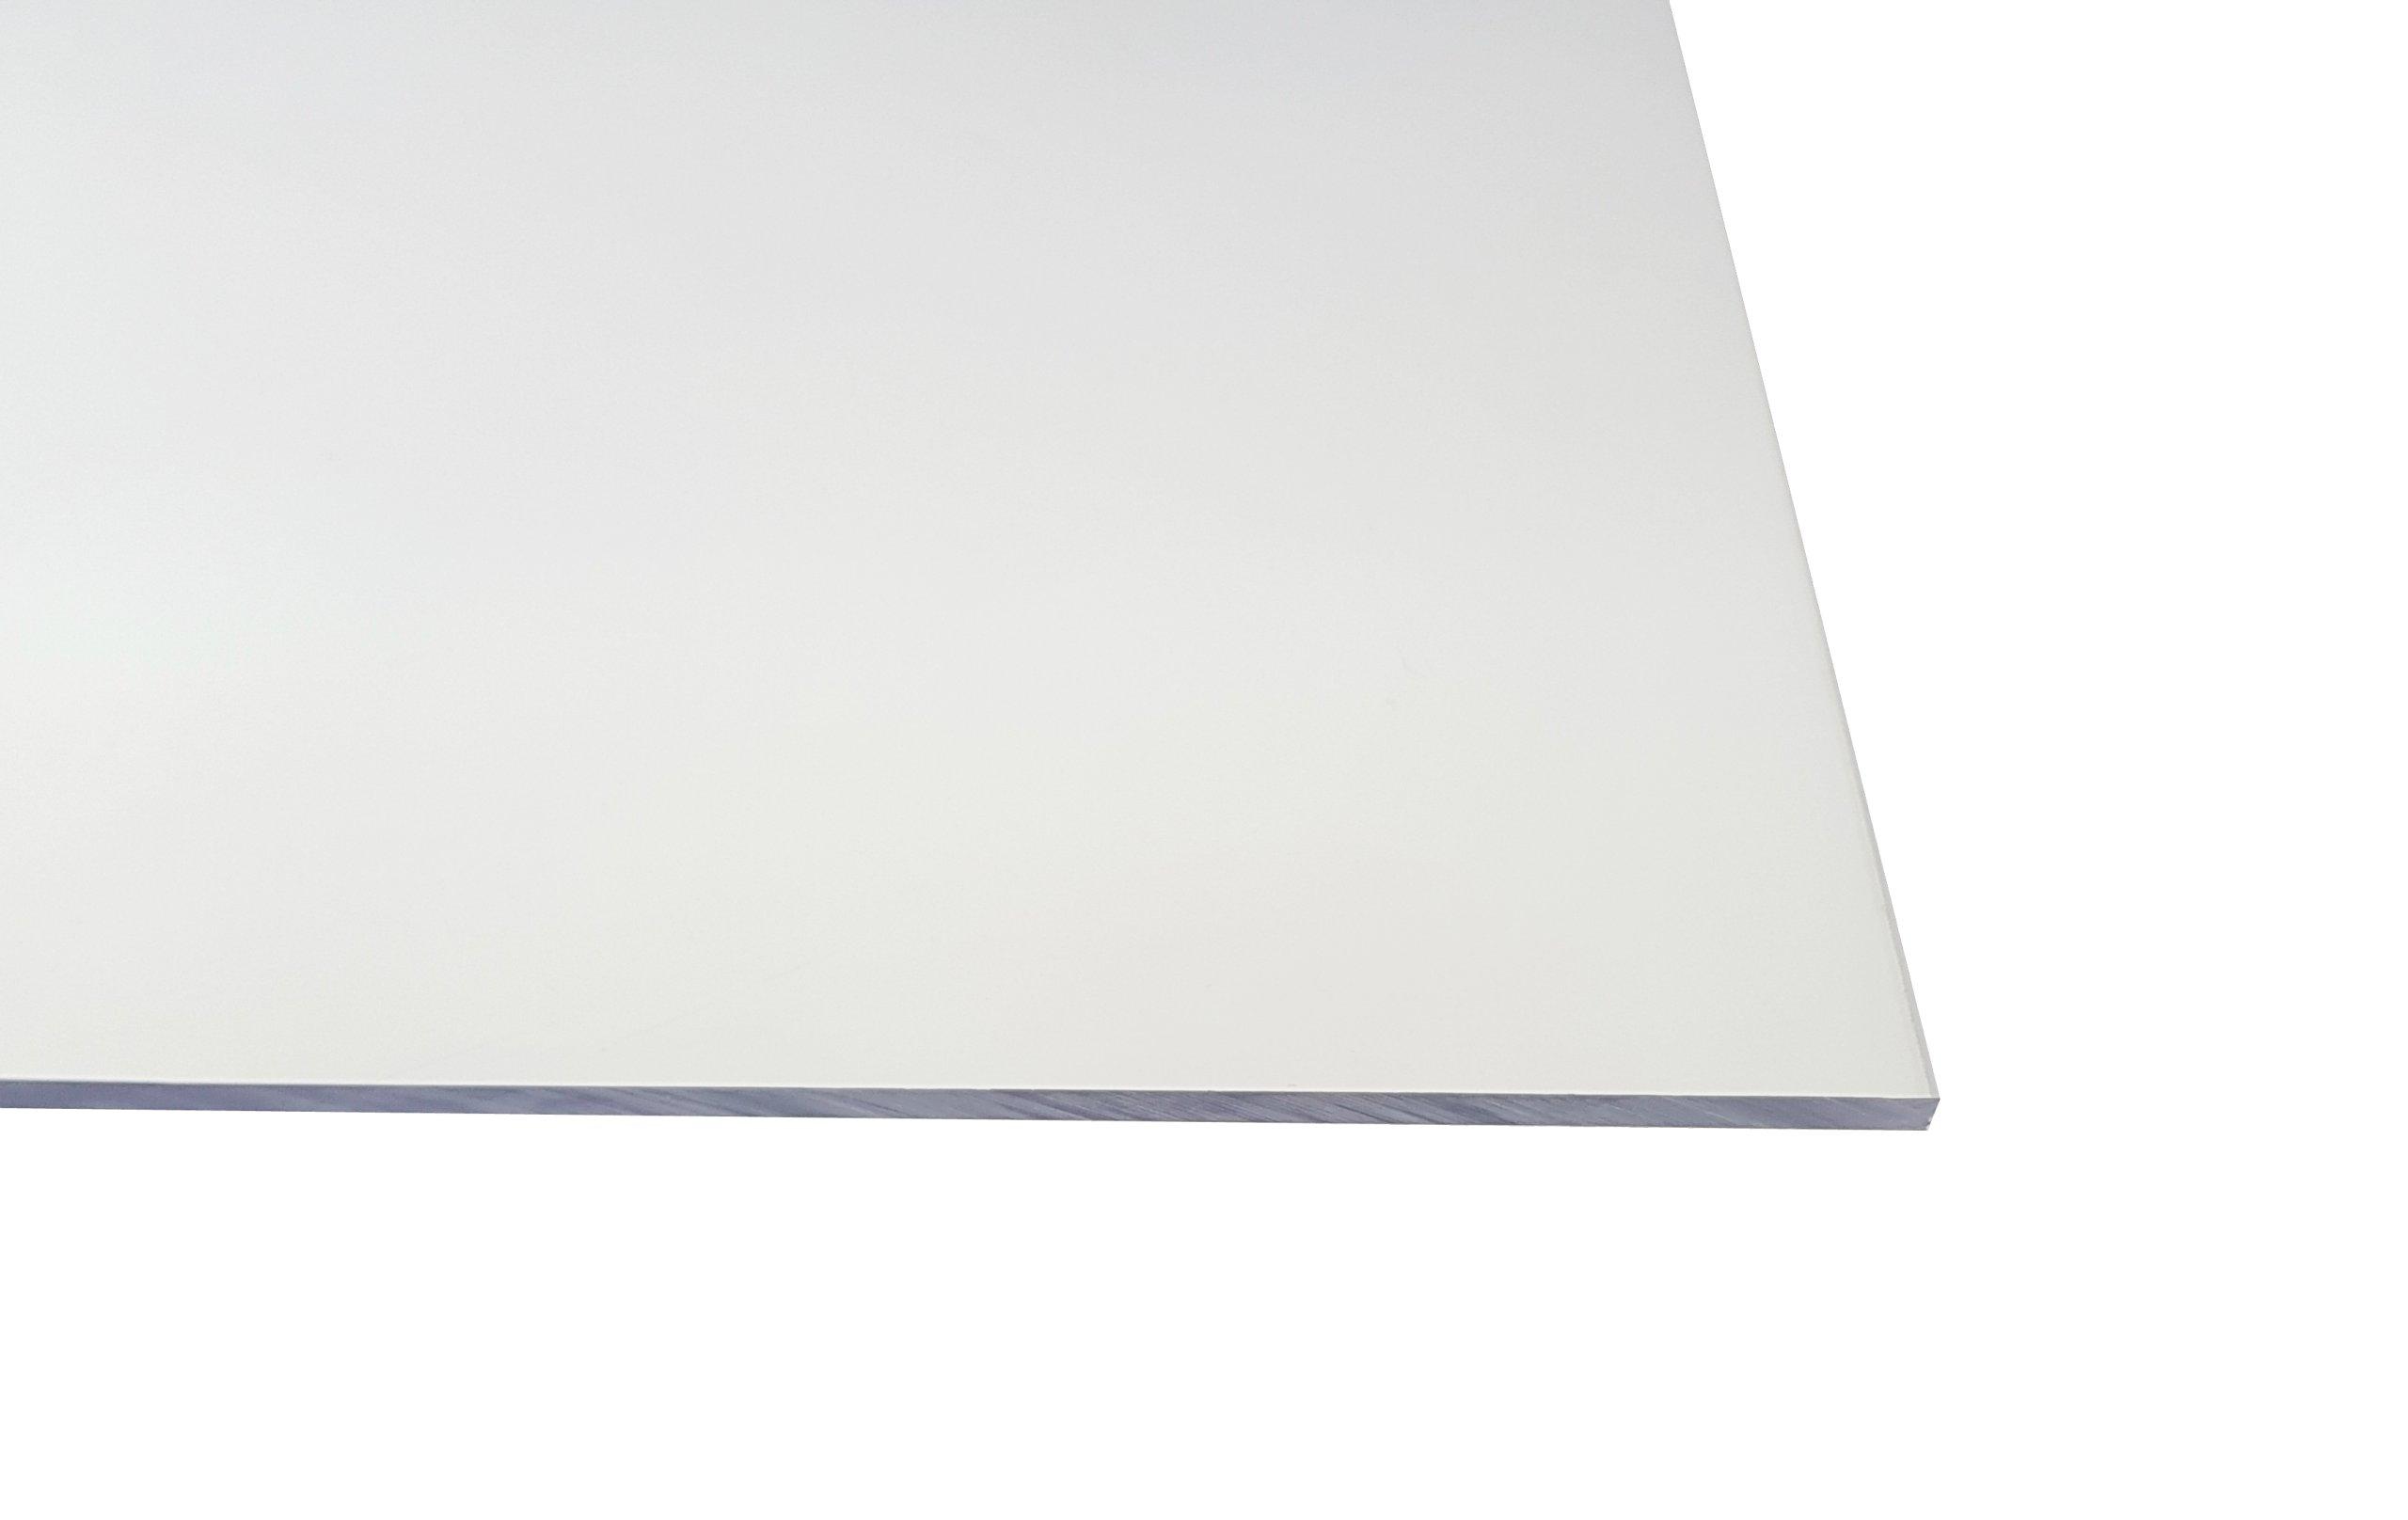 Polykarbonátové listy Lexan 4mm bezfarebné sklo F DPH